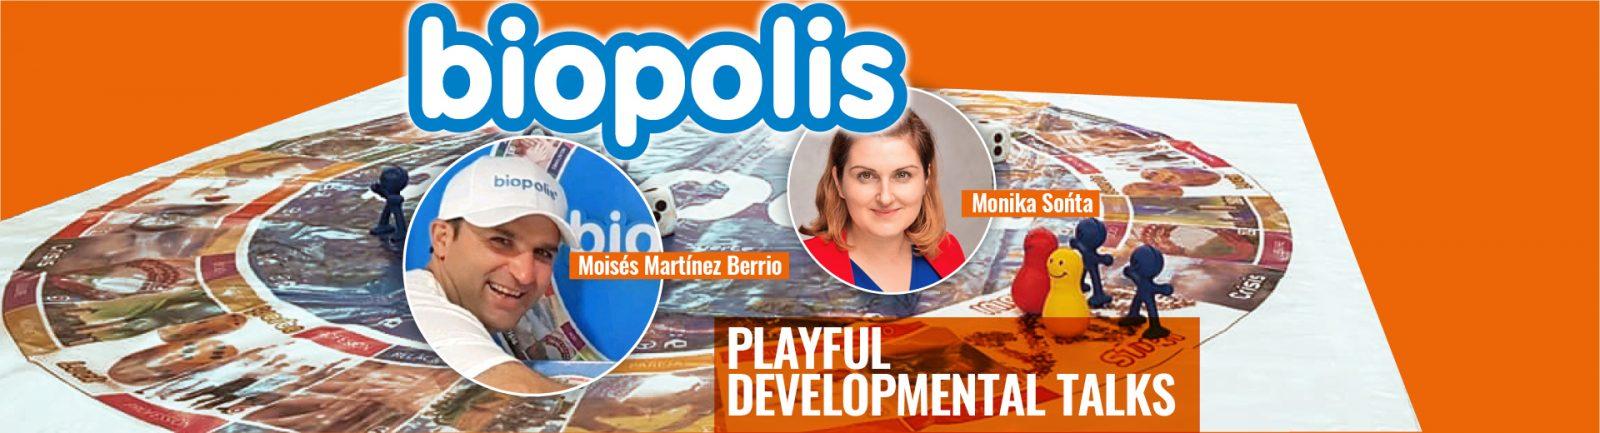 biopolis3